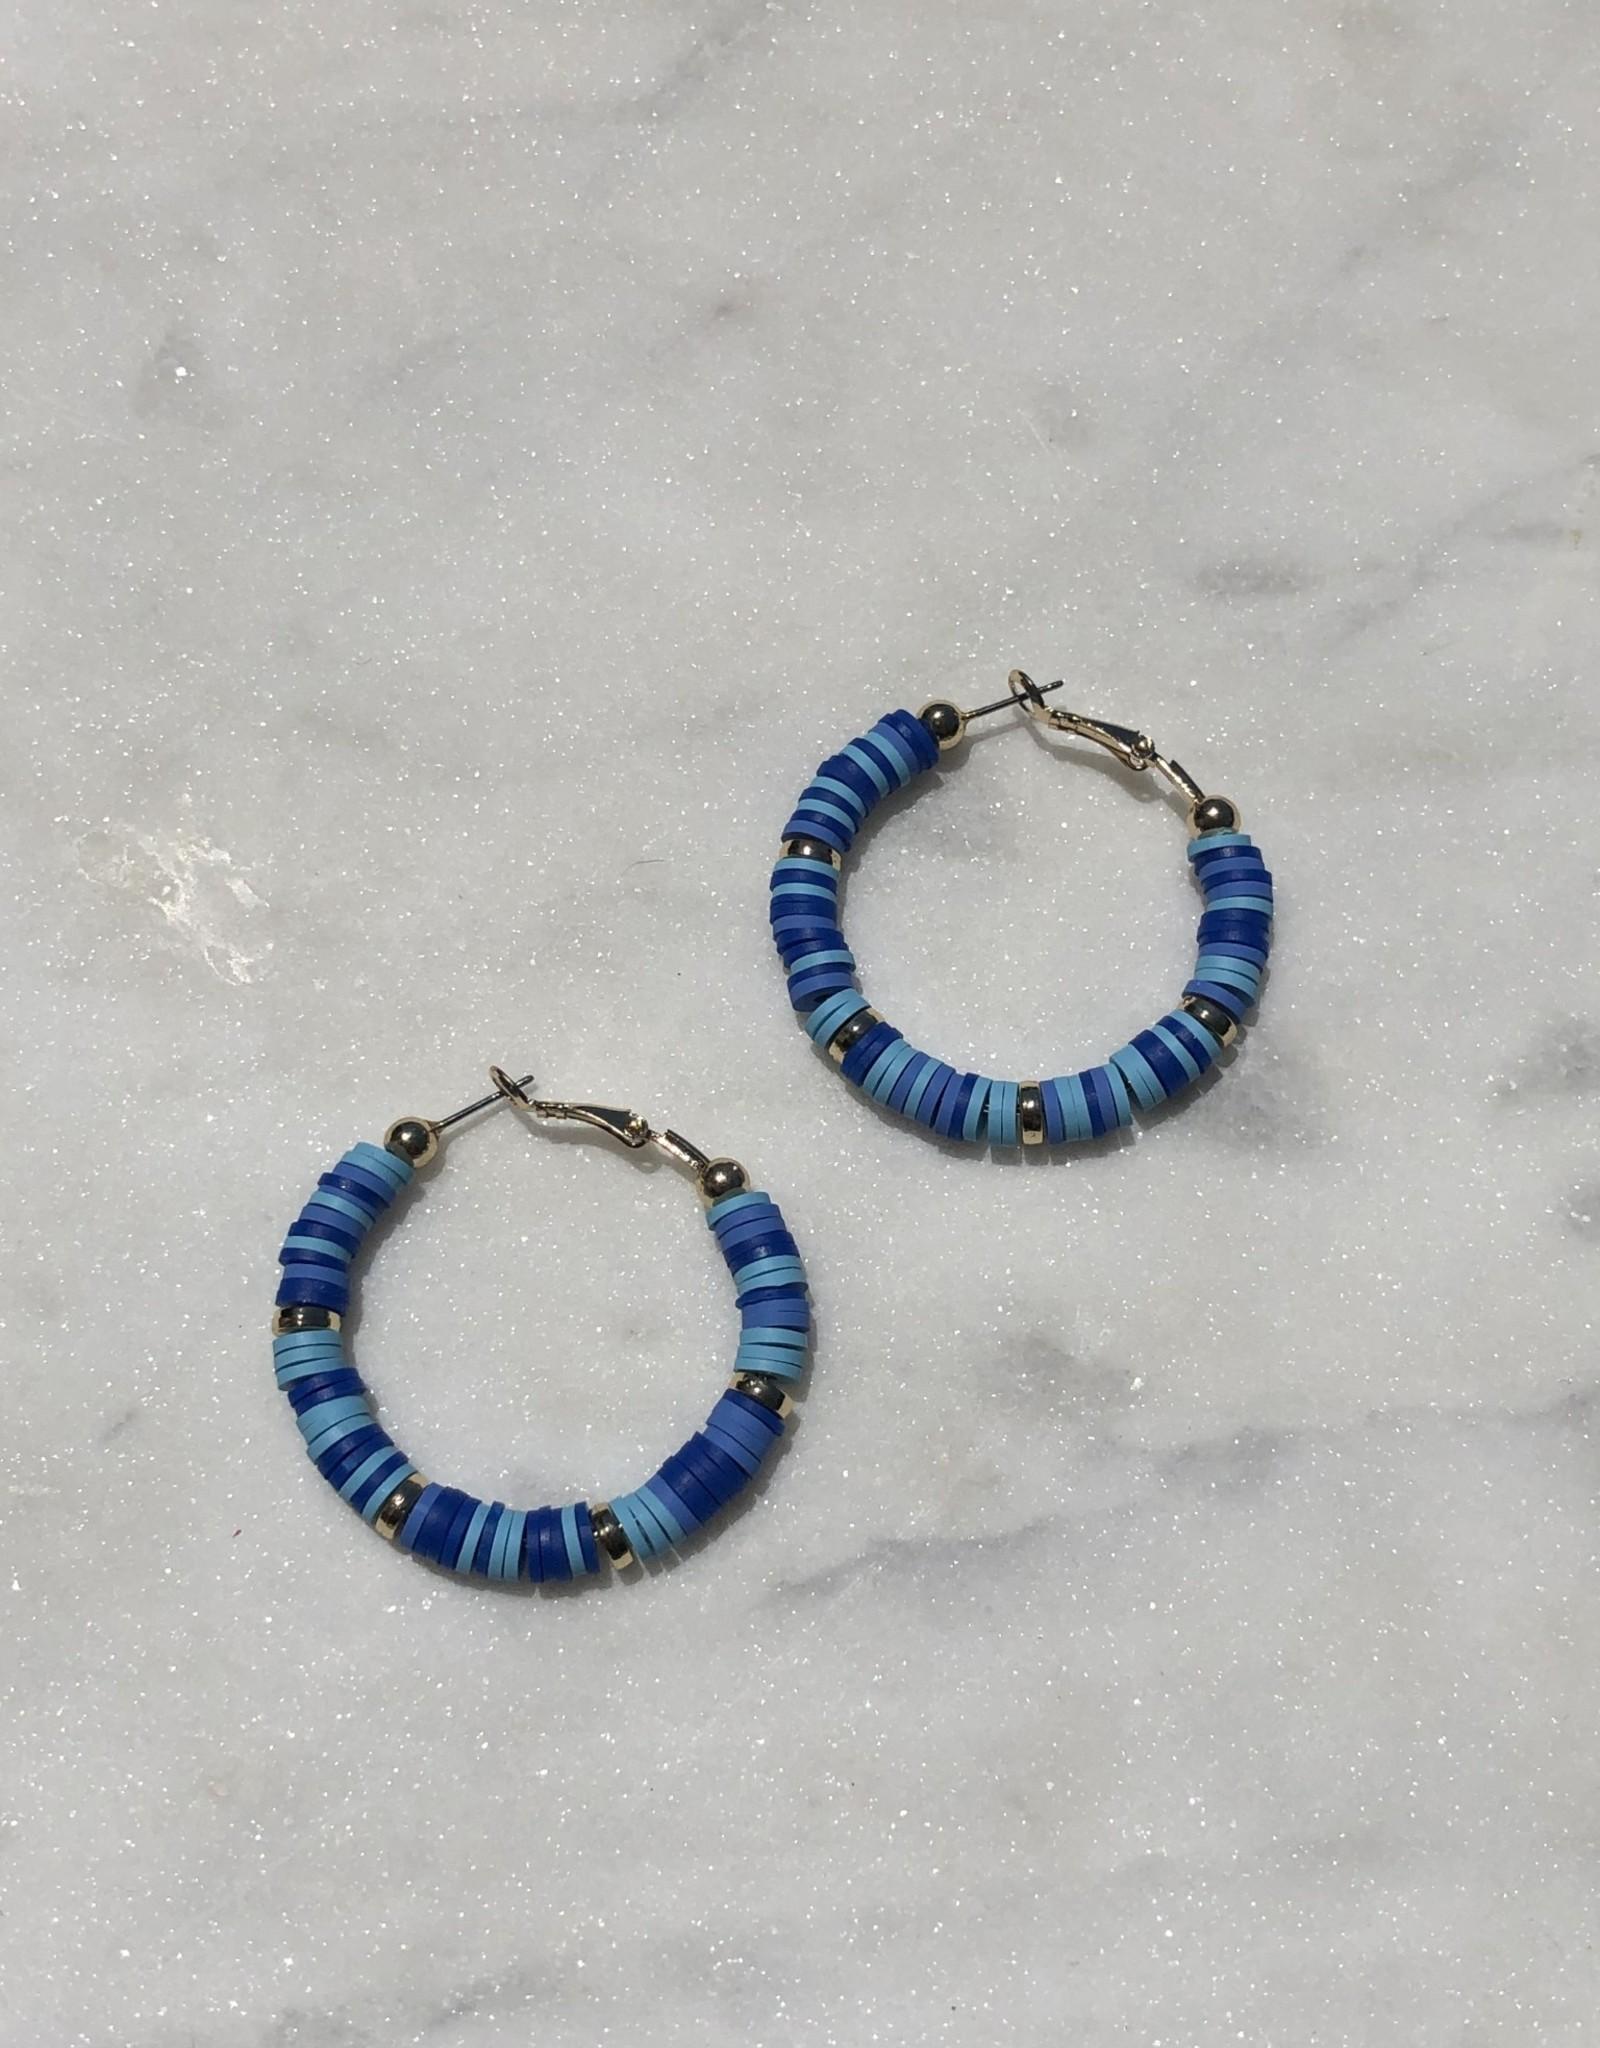 Wink Rubber Disc Hoop Earrings